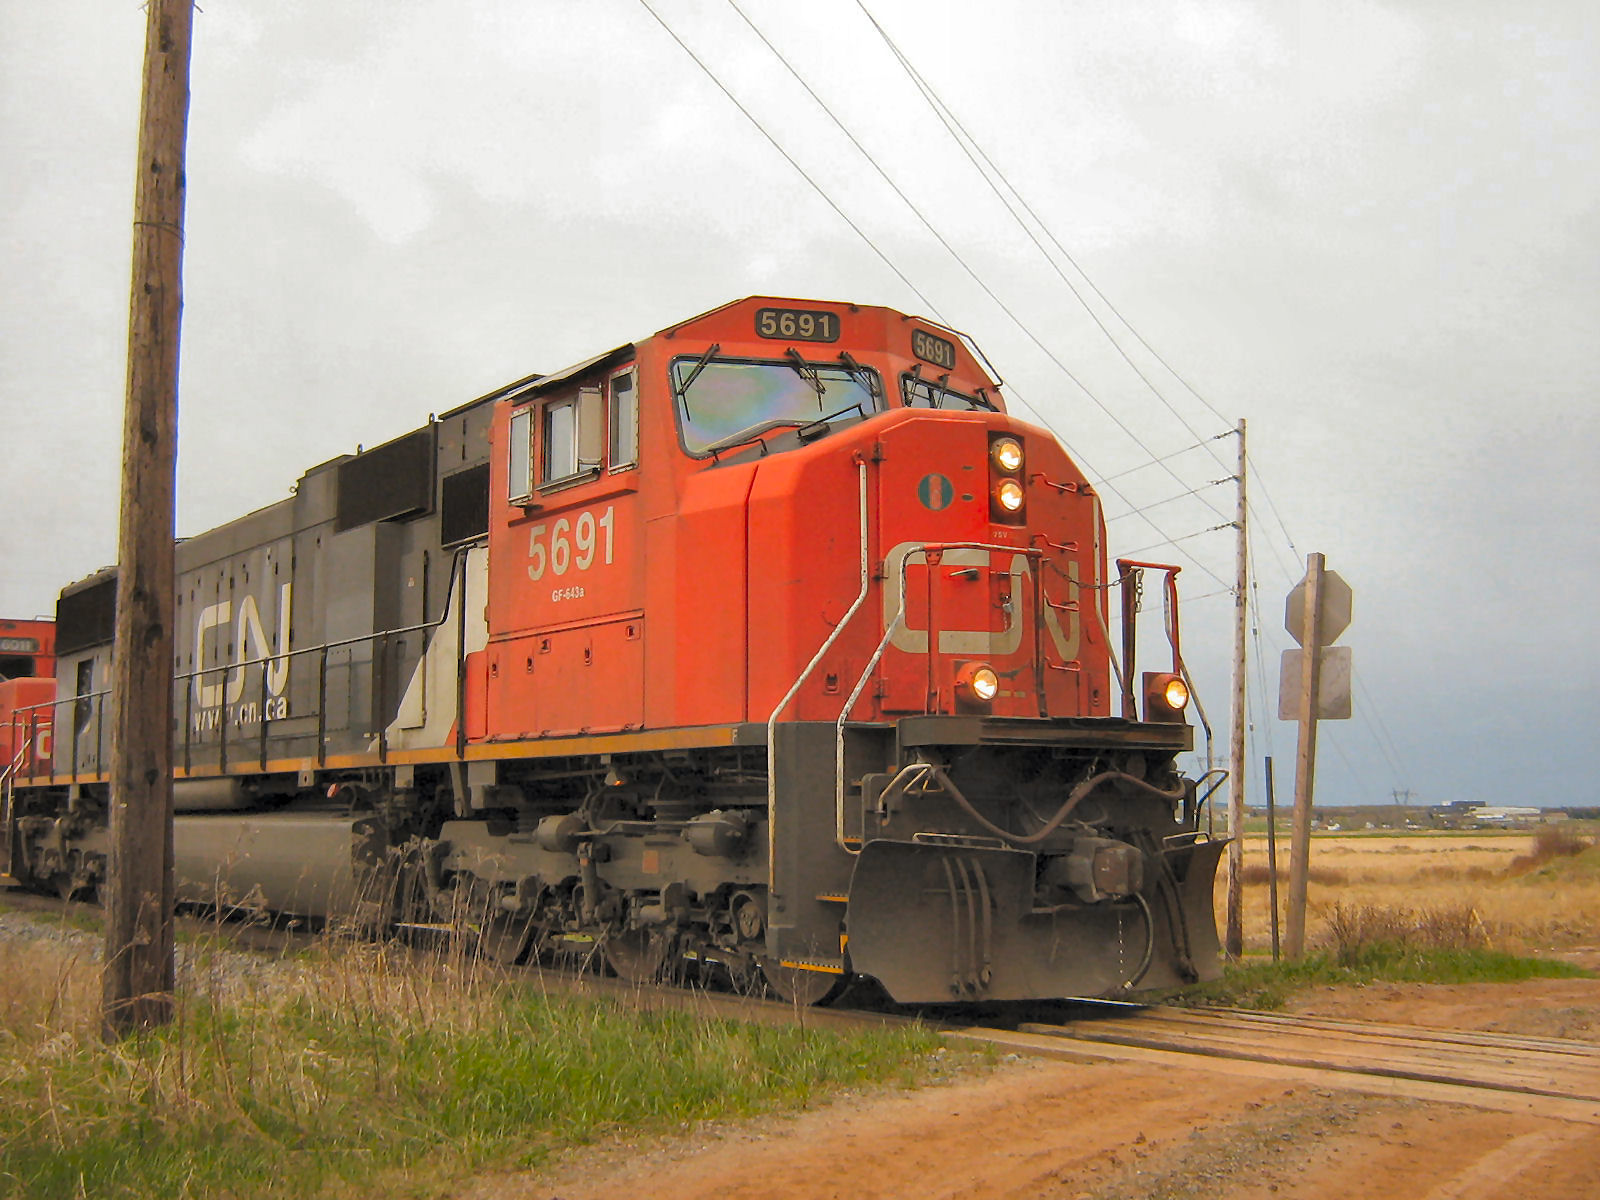 CN Freight Train